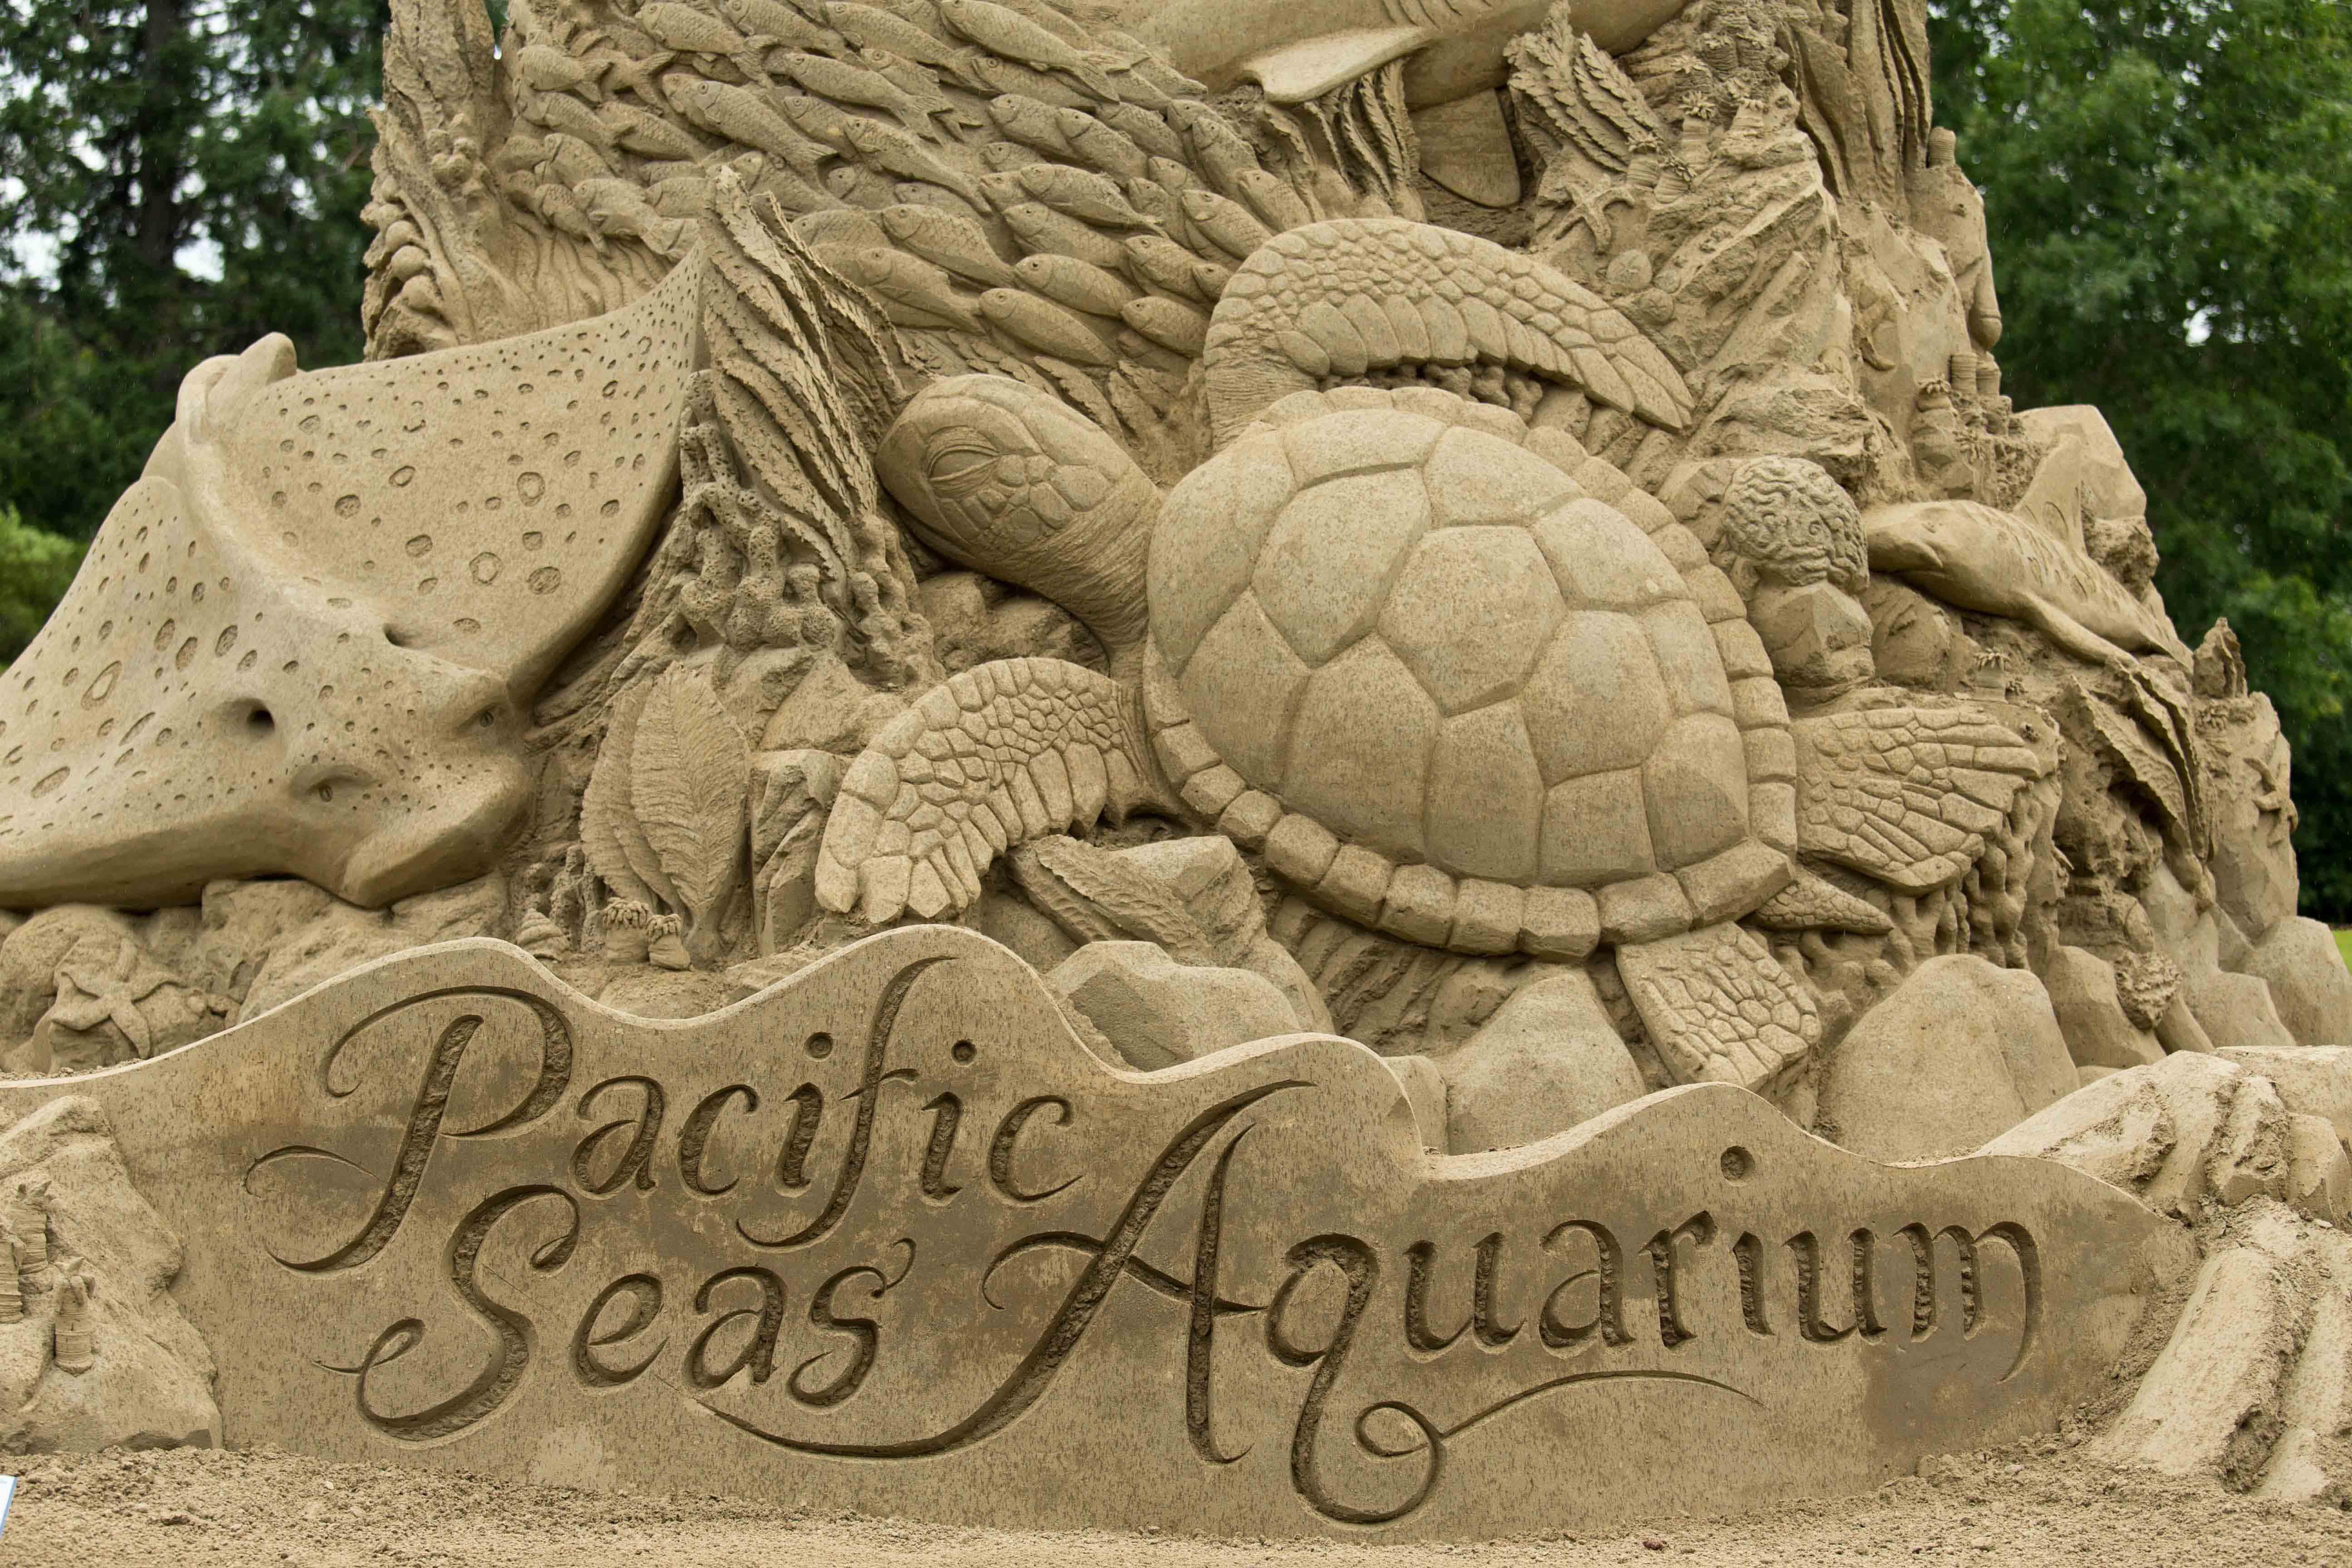 Baja Beach Sand Sculpture Now Up At Point Defiance Zoo Aquarium